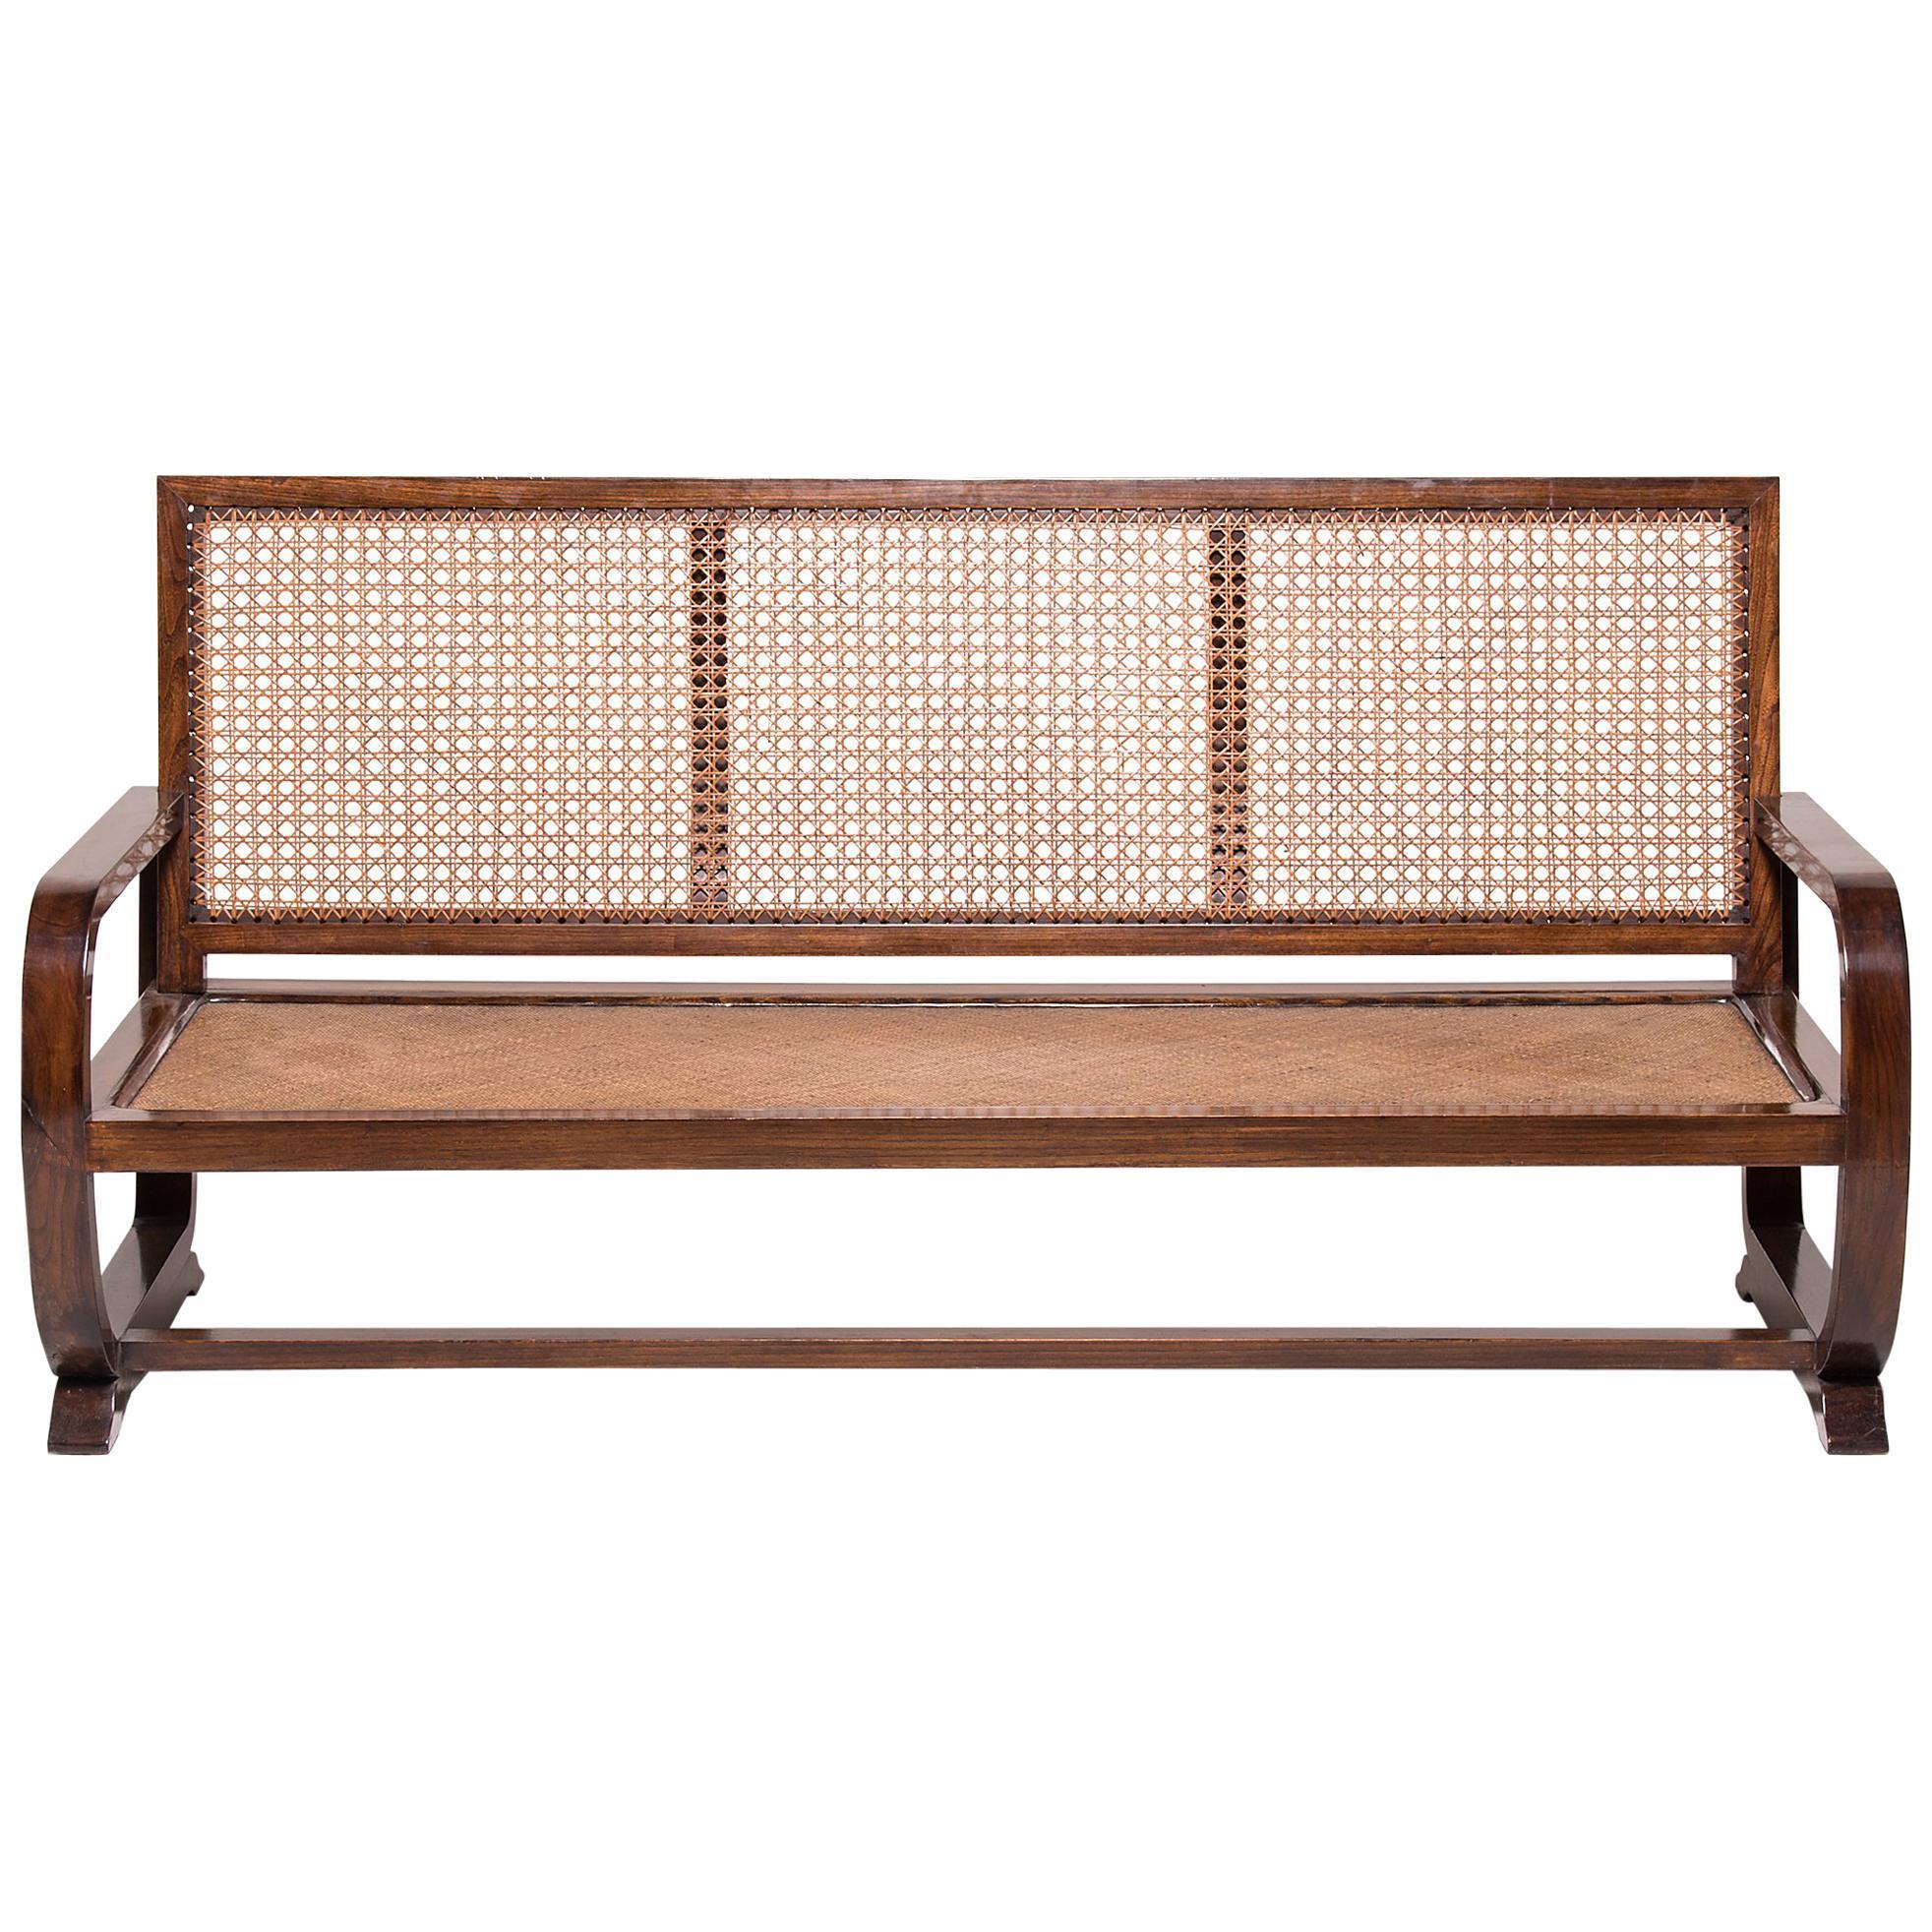 Chinese Caned Three-Seat Sofa